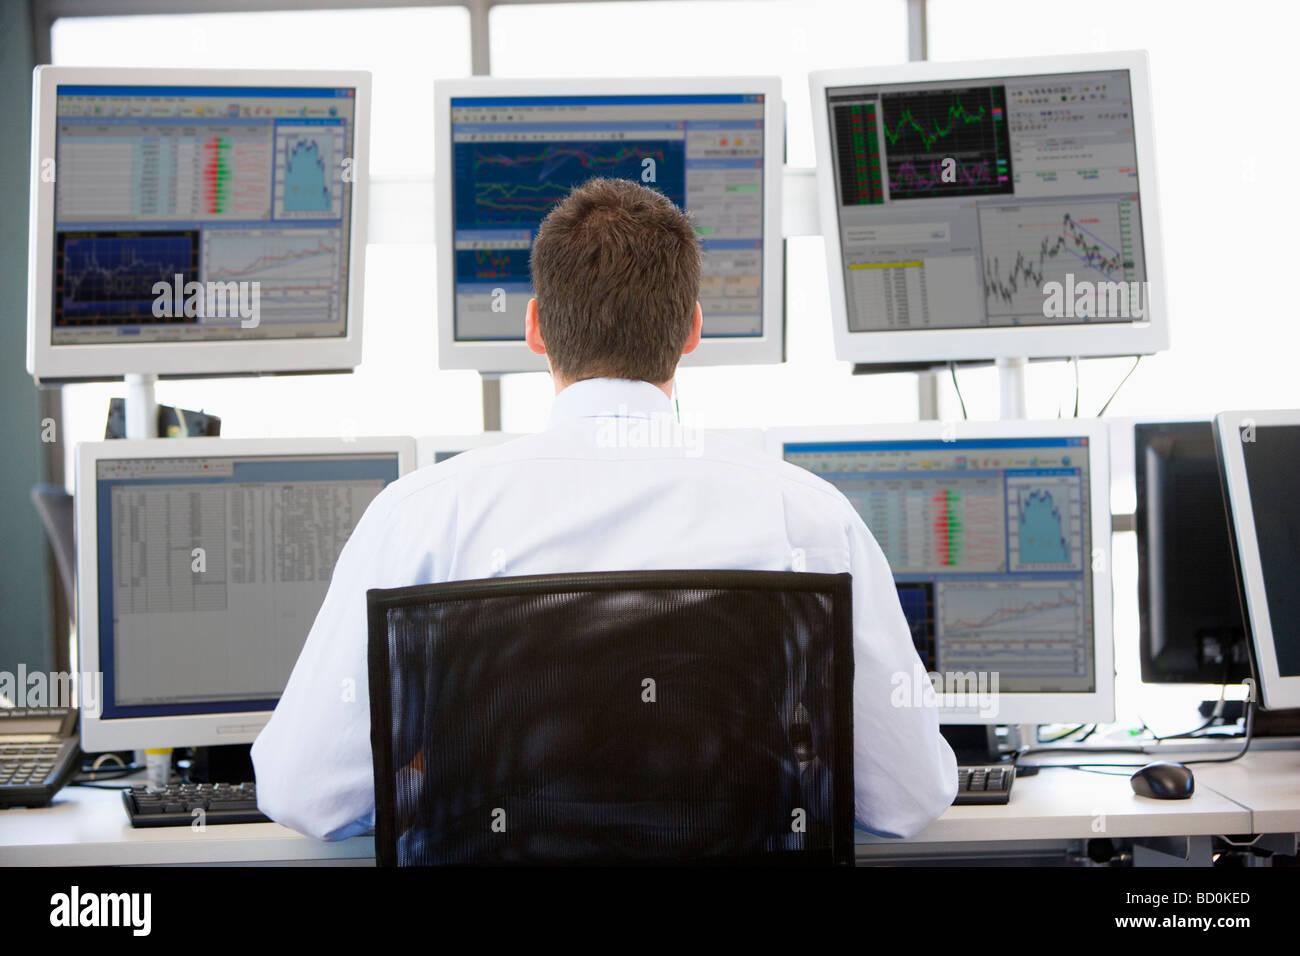 Stock Trader Mirando varios monitores Imagen De Stock